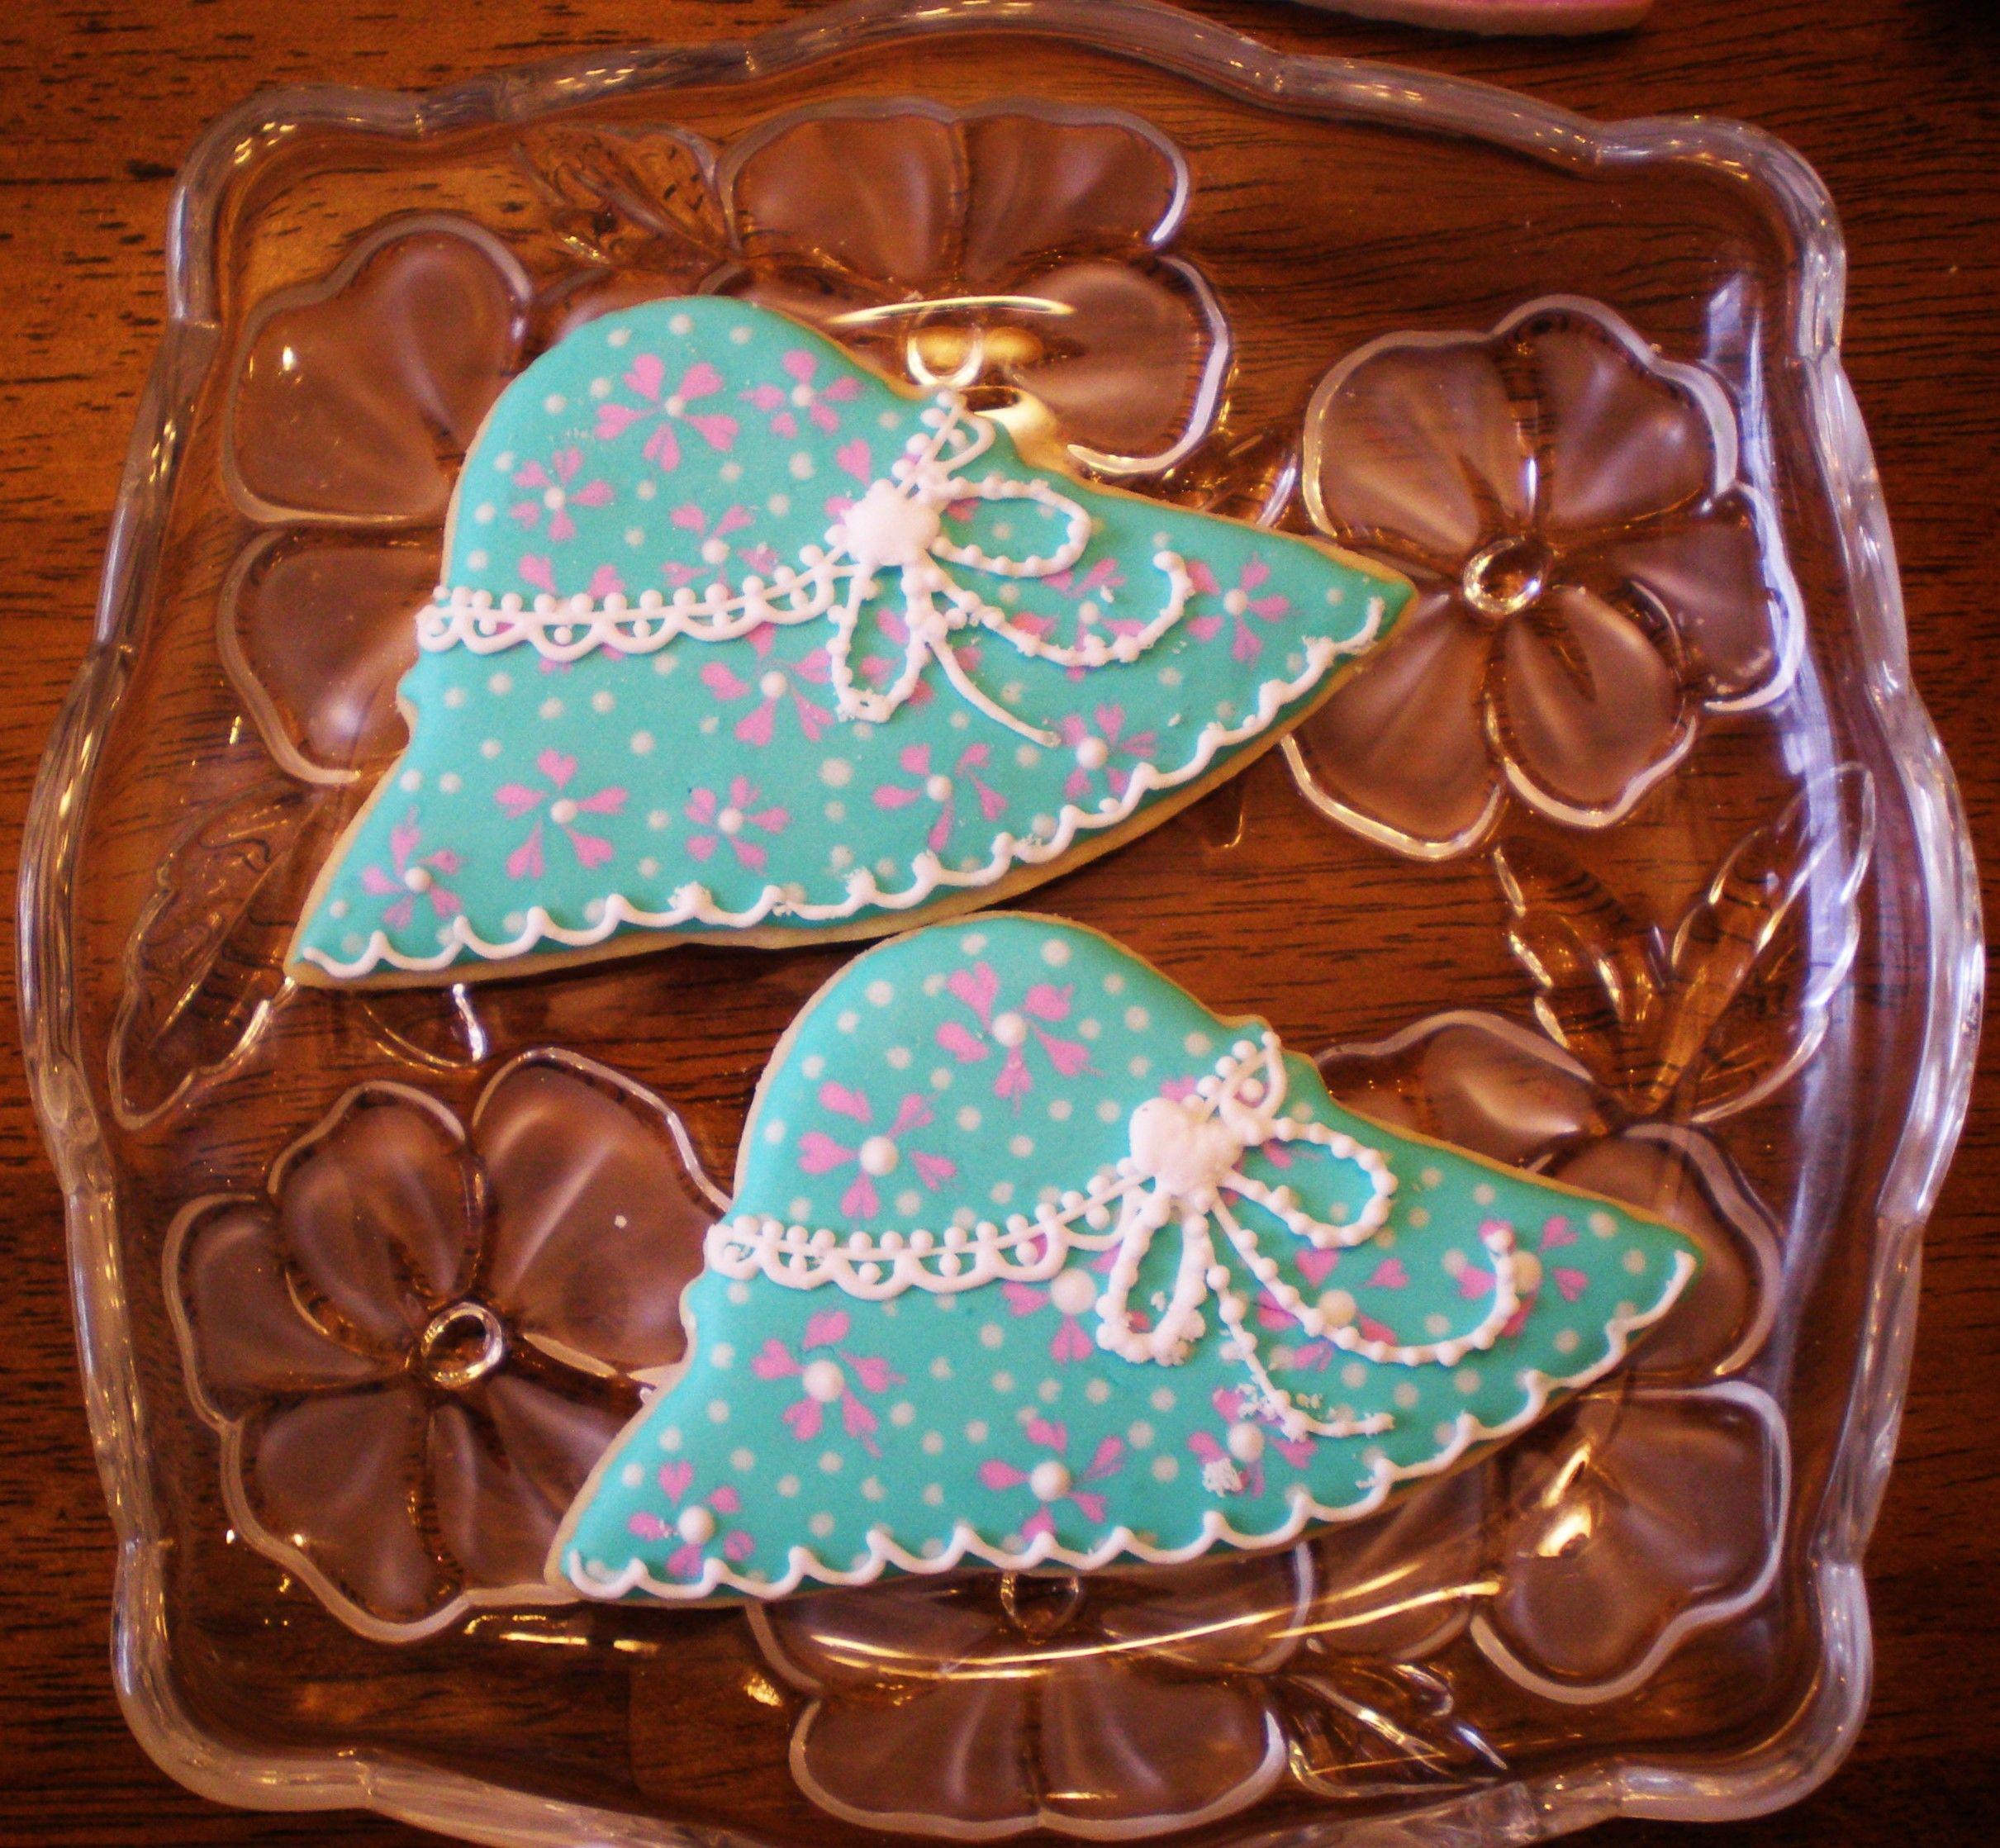 Designer Easter hat cookies by Dot Cash